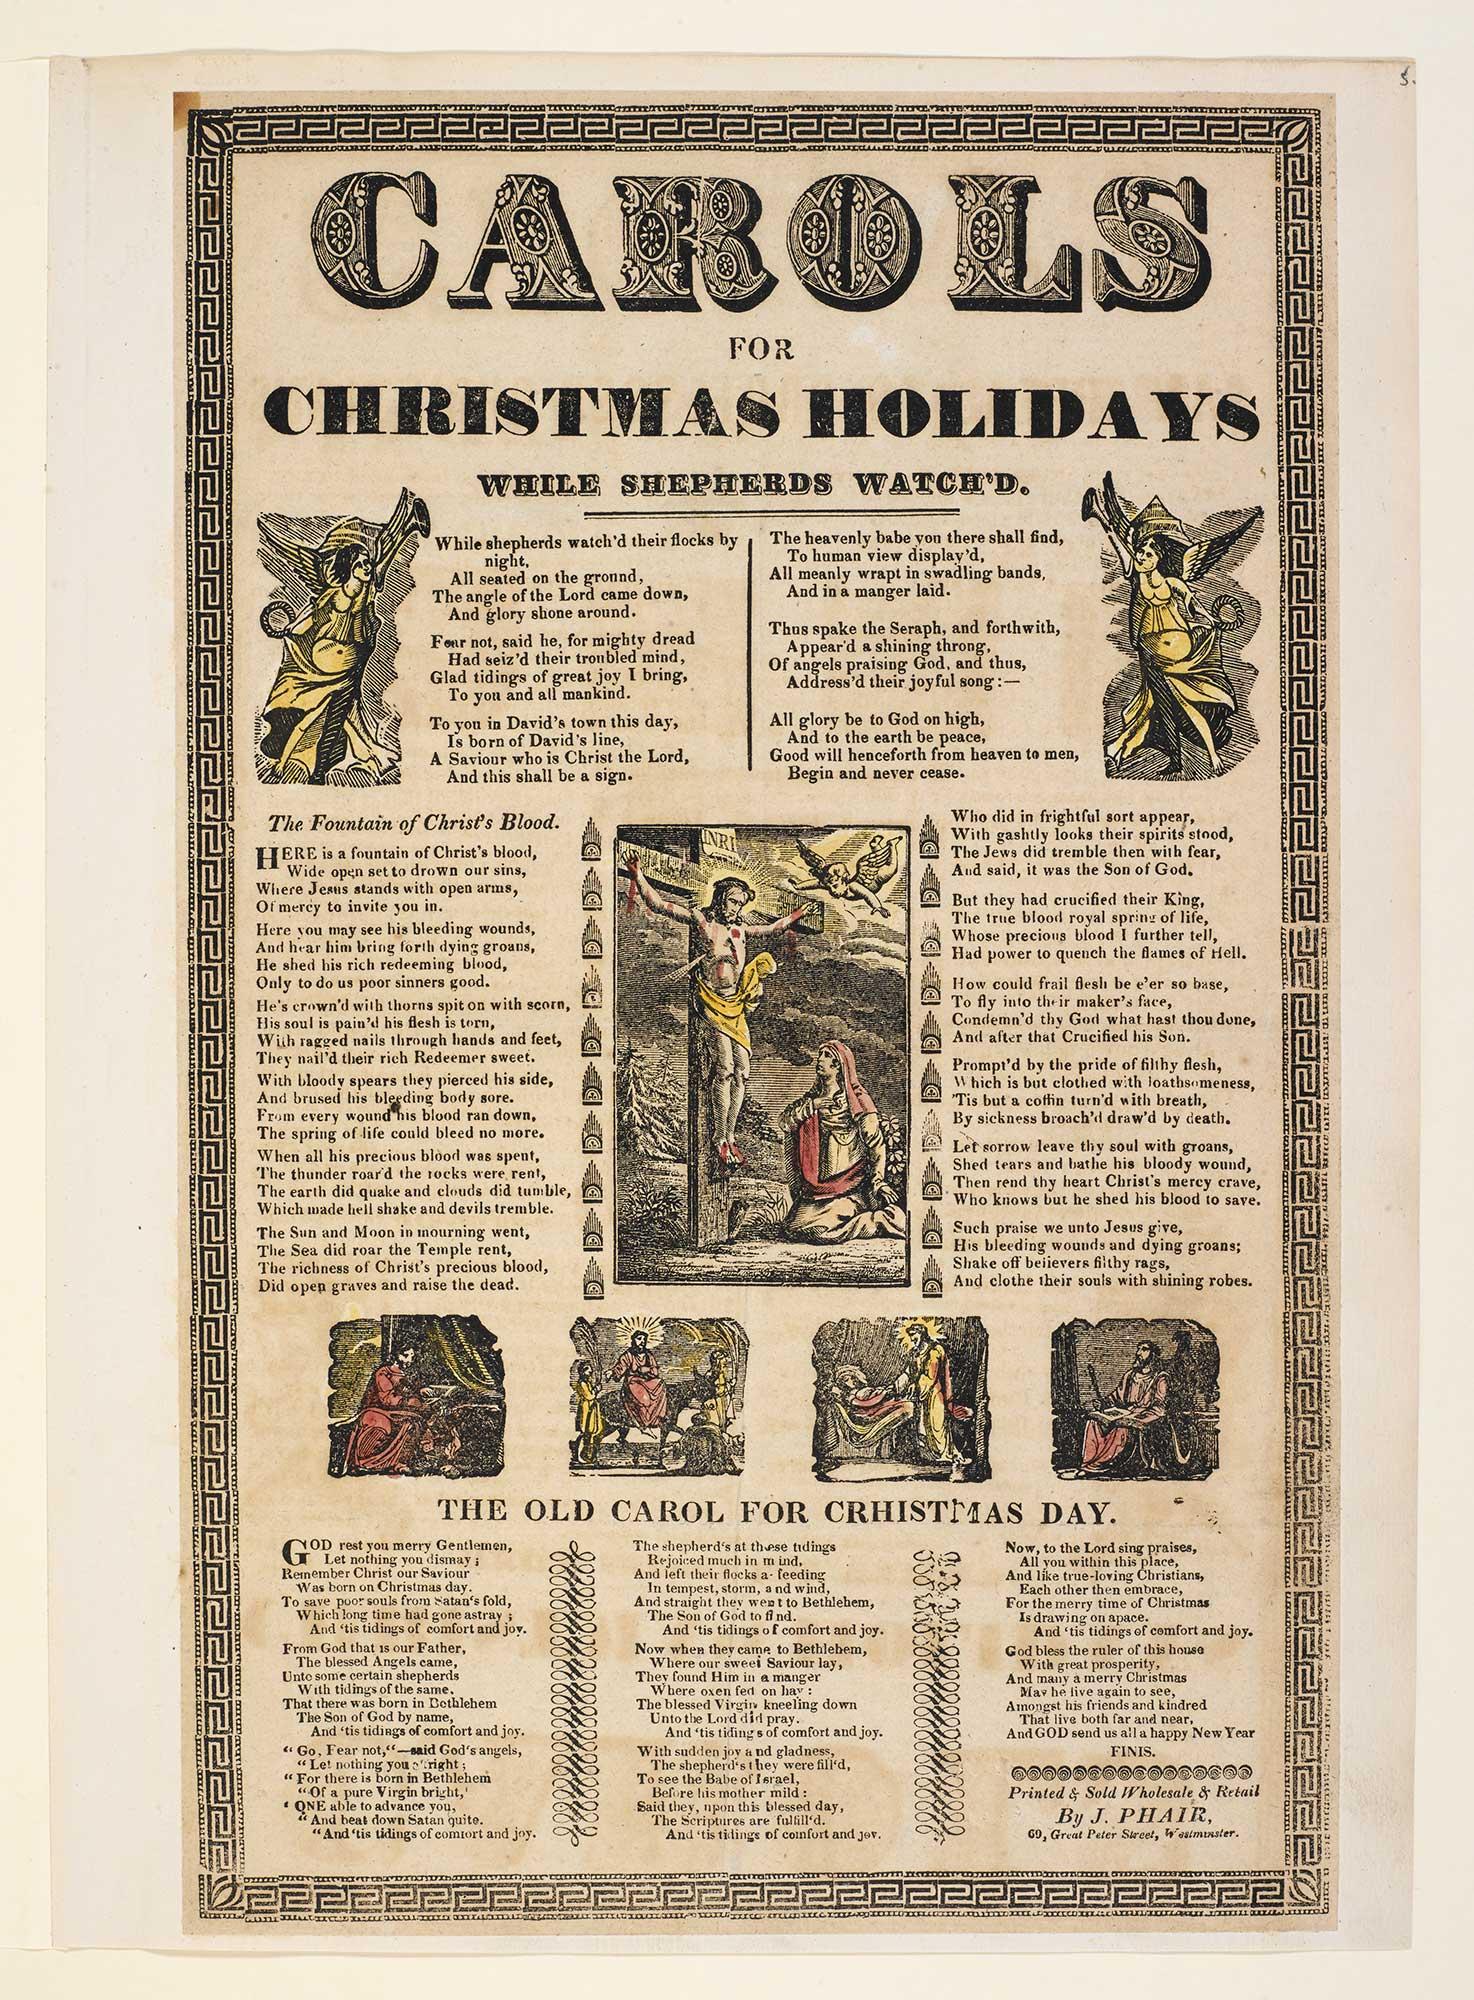 Broadside: Carols for Christmas Holidays